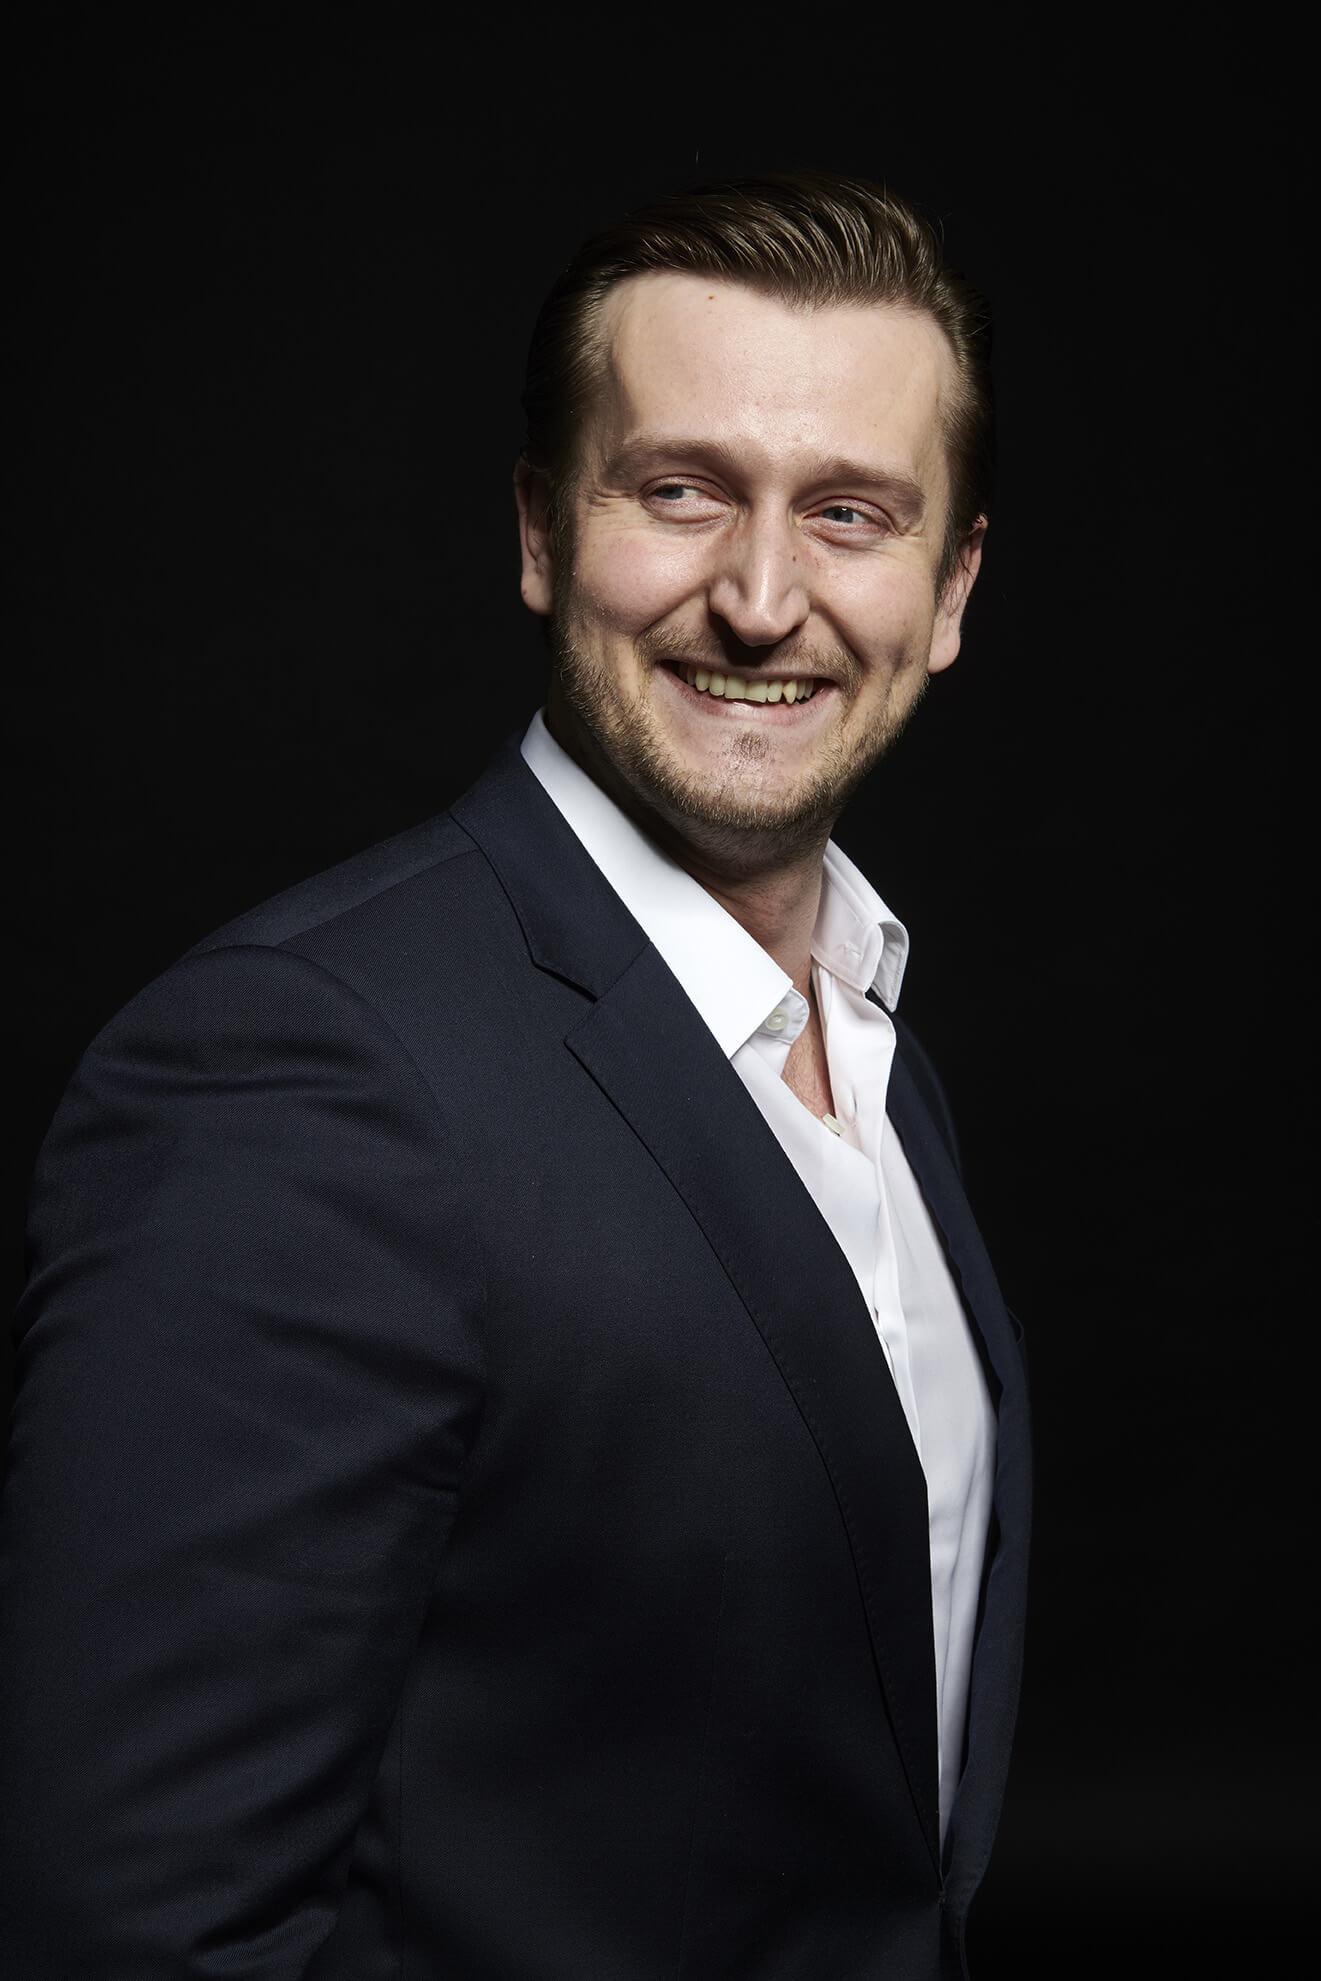 Martin Smatana